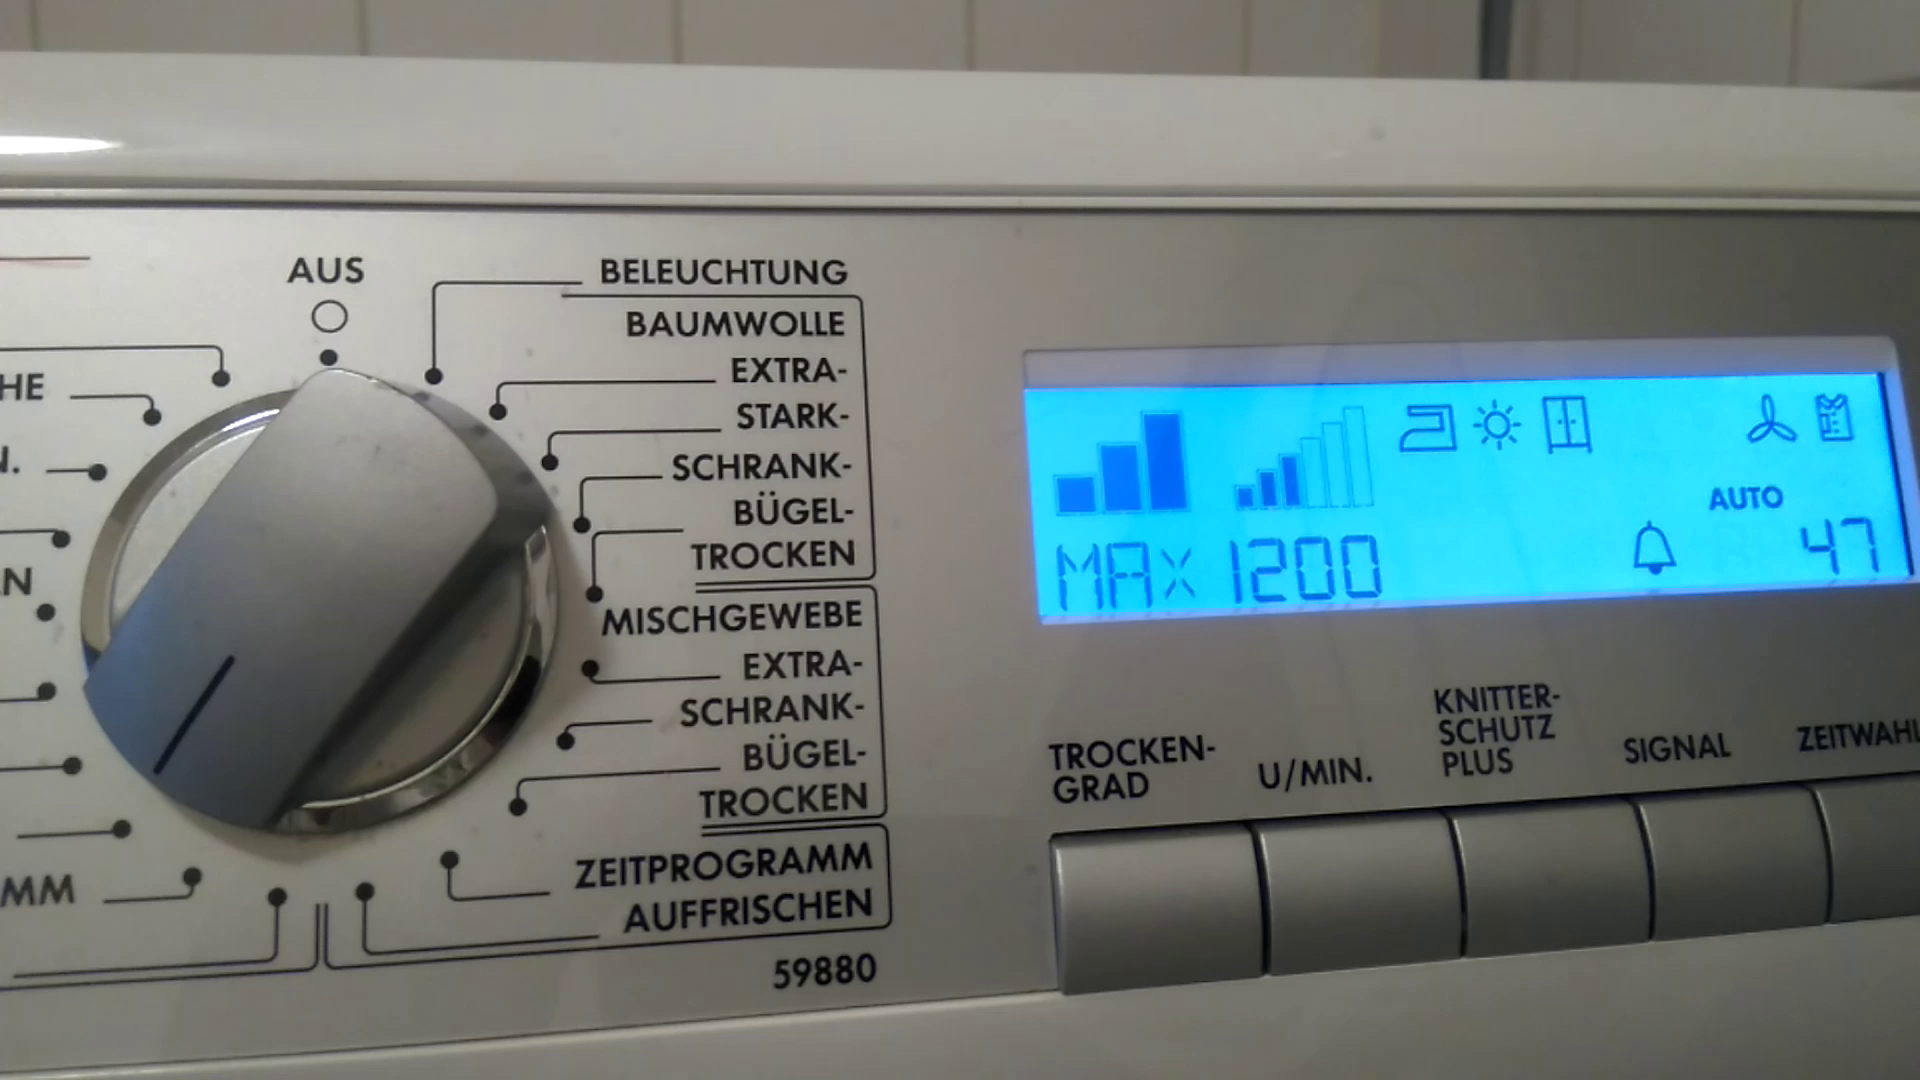 Aeg Santo Kühlschrank Piept : Aeg spülmaschine favorit bedienungsanleitung geschirrspüler aeg